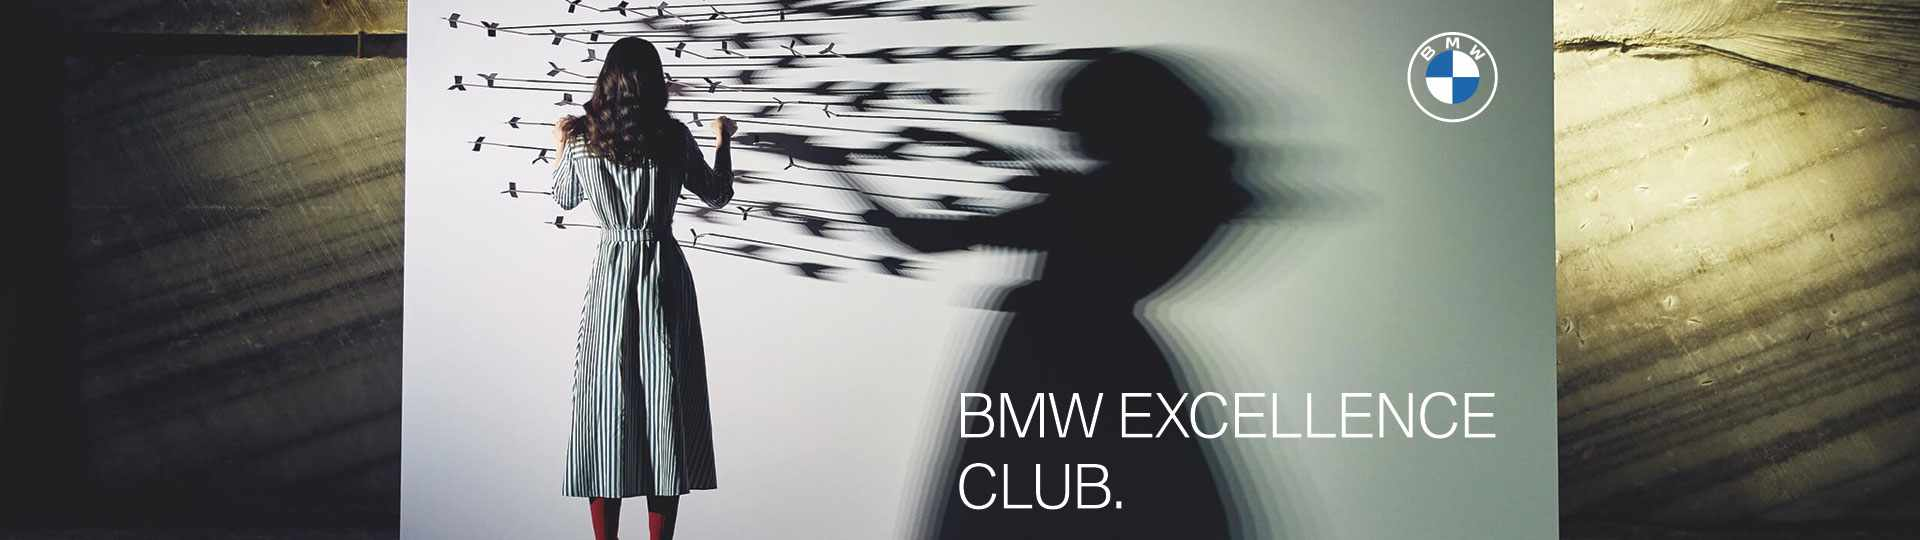 header_bmw_excellence_club_2021.jpg